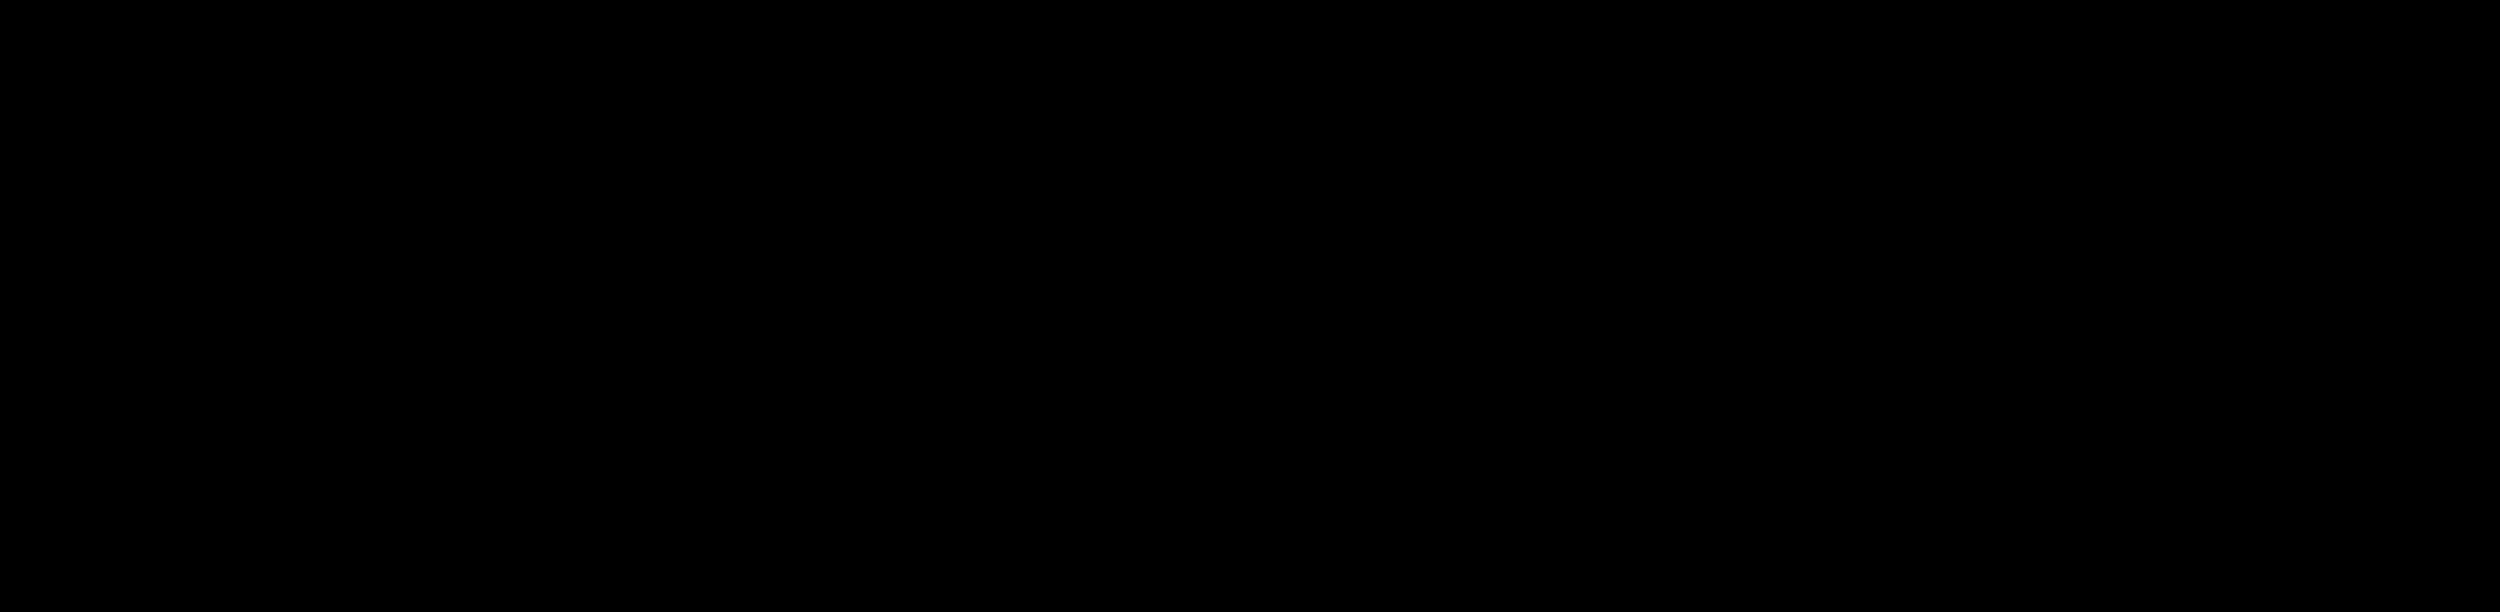 GoFan(DHT) and Huddle Tickets_HuddleTicketsAndGoFan_black.png